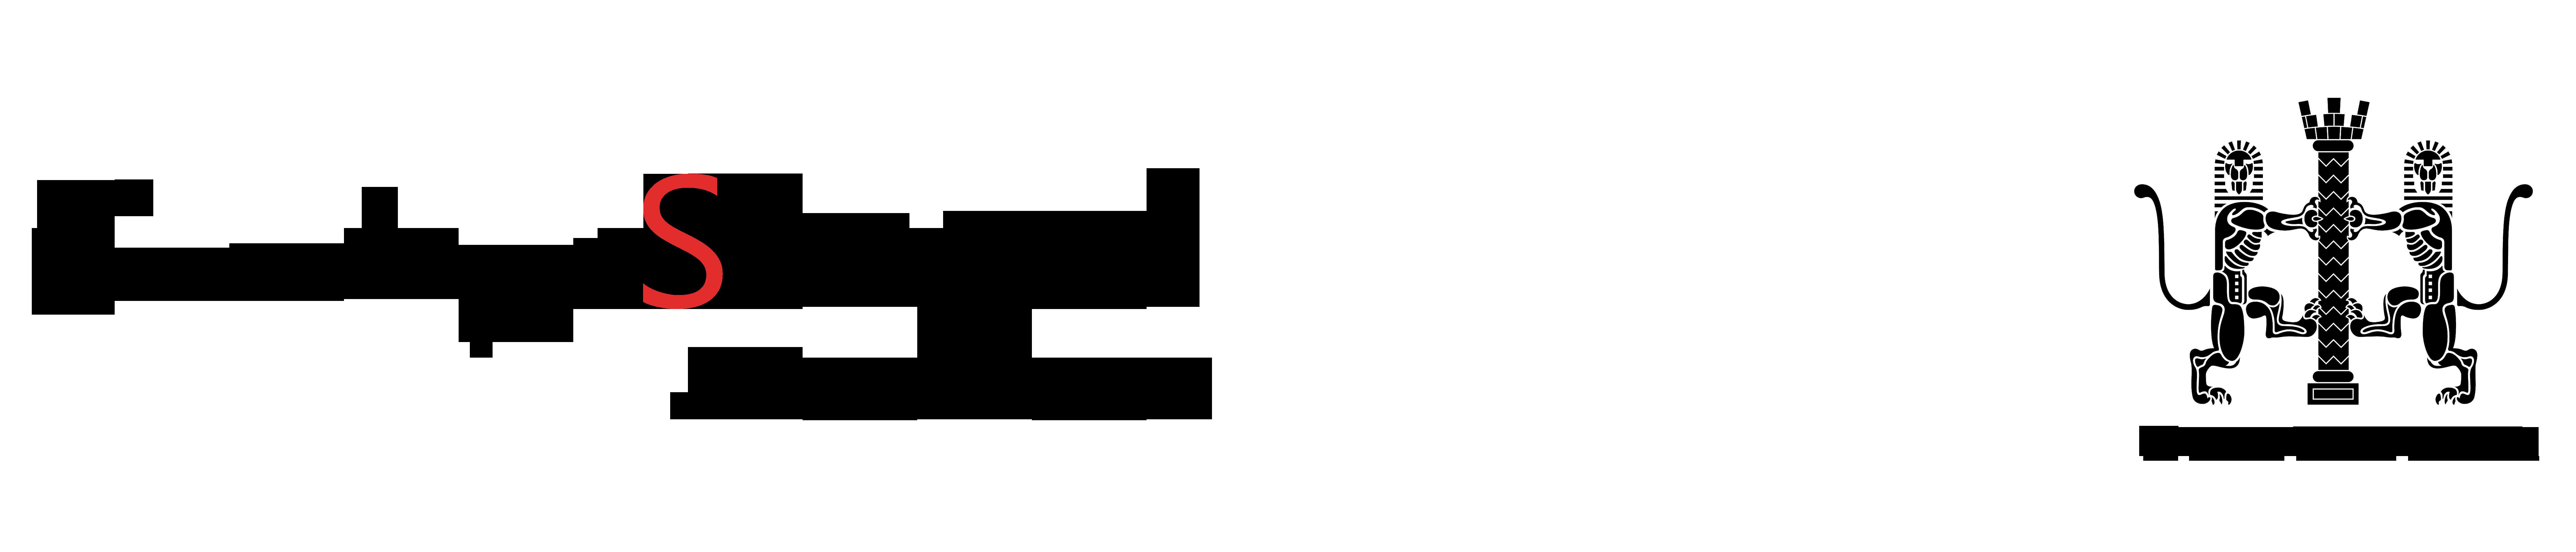 copy44_RIBA-Header-+-SSA